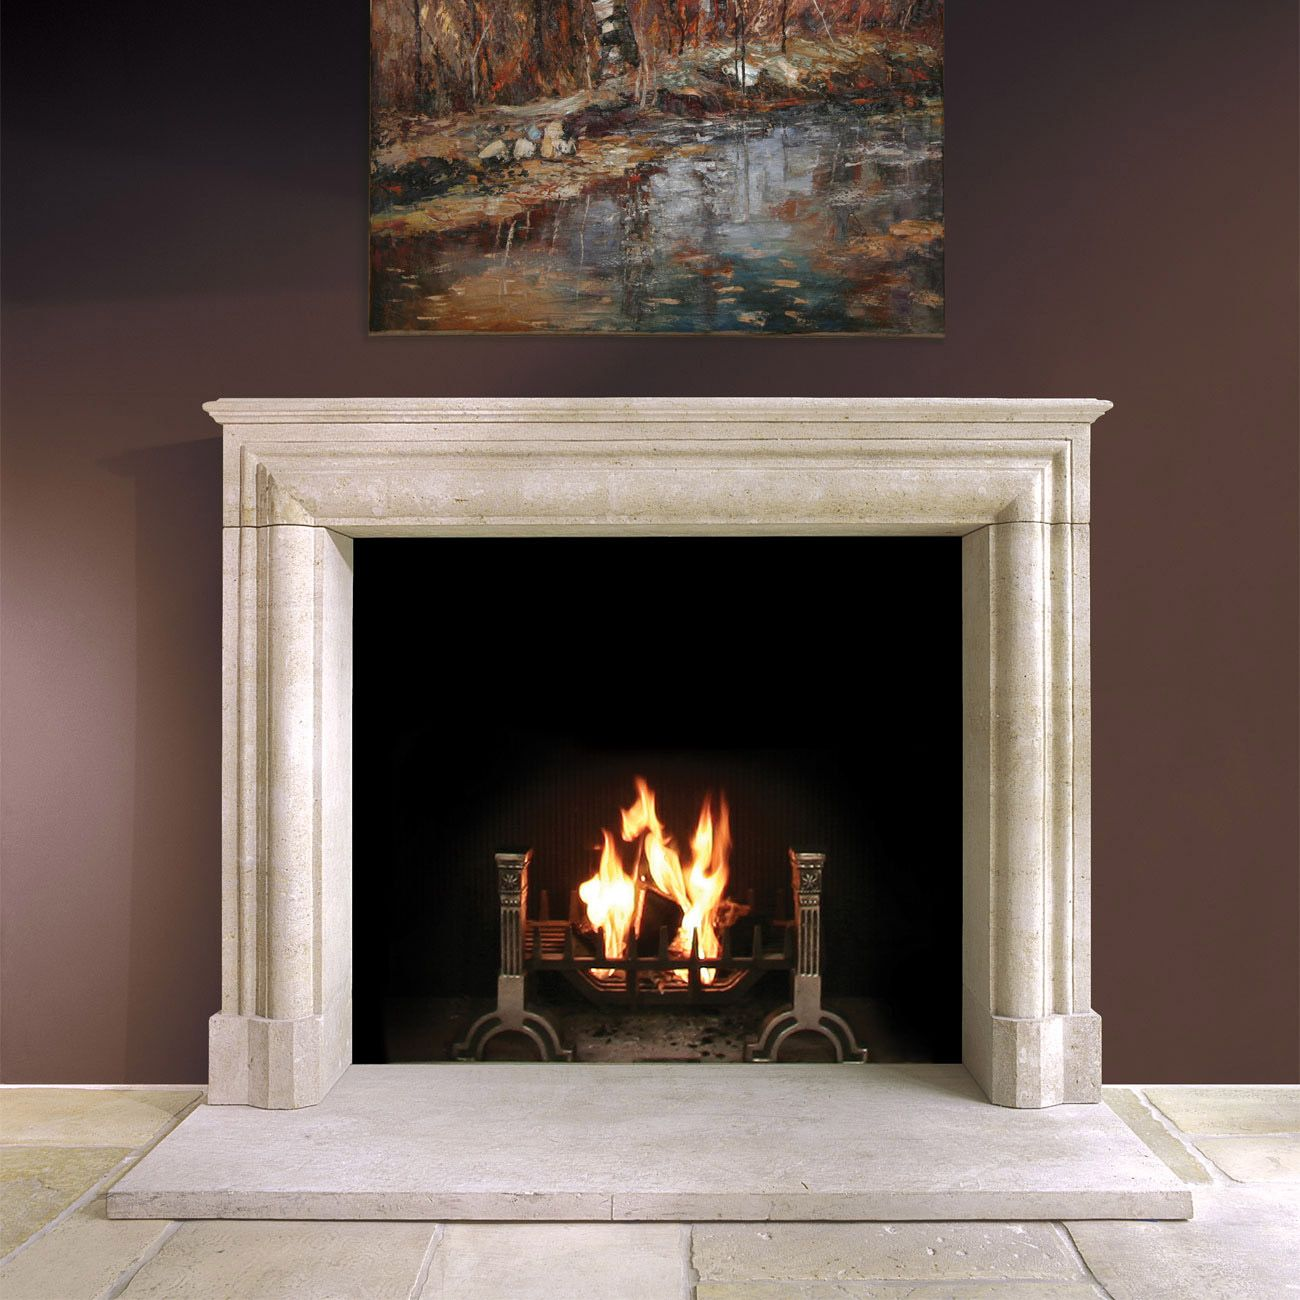 Stone fireplace surround and Fireplace surrounds